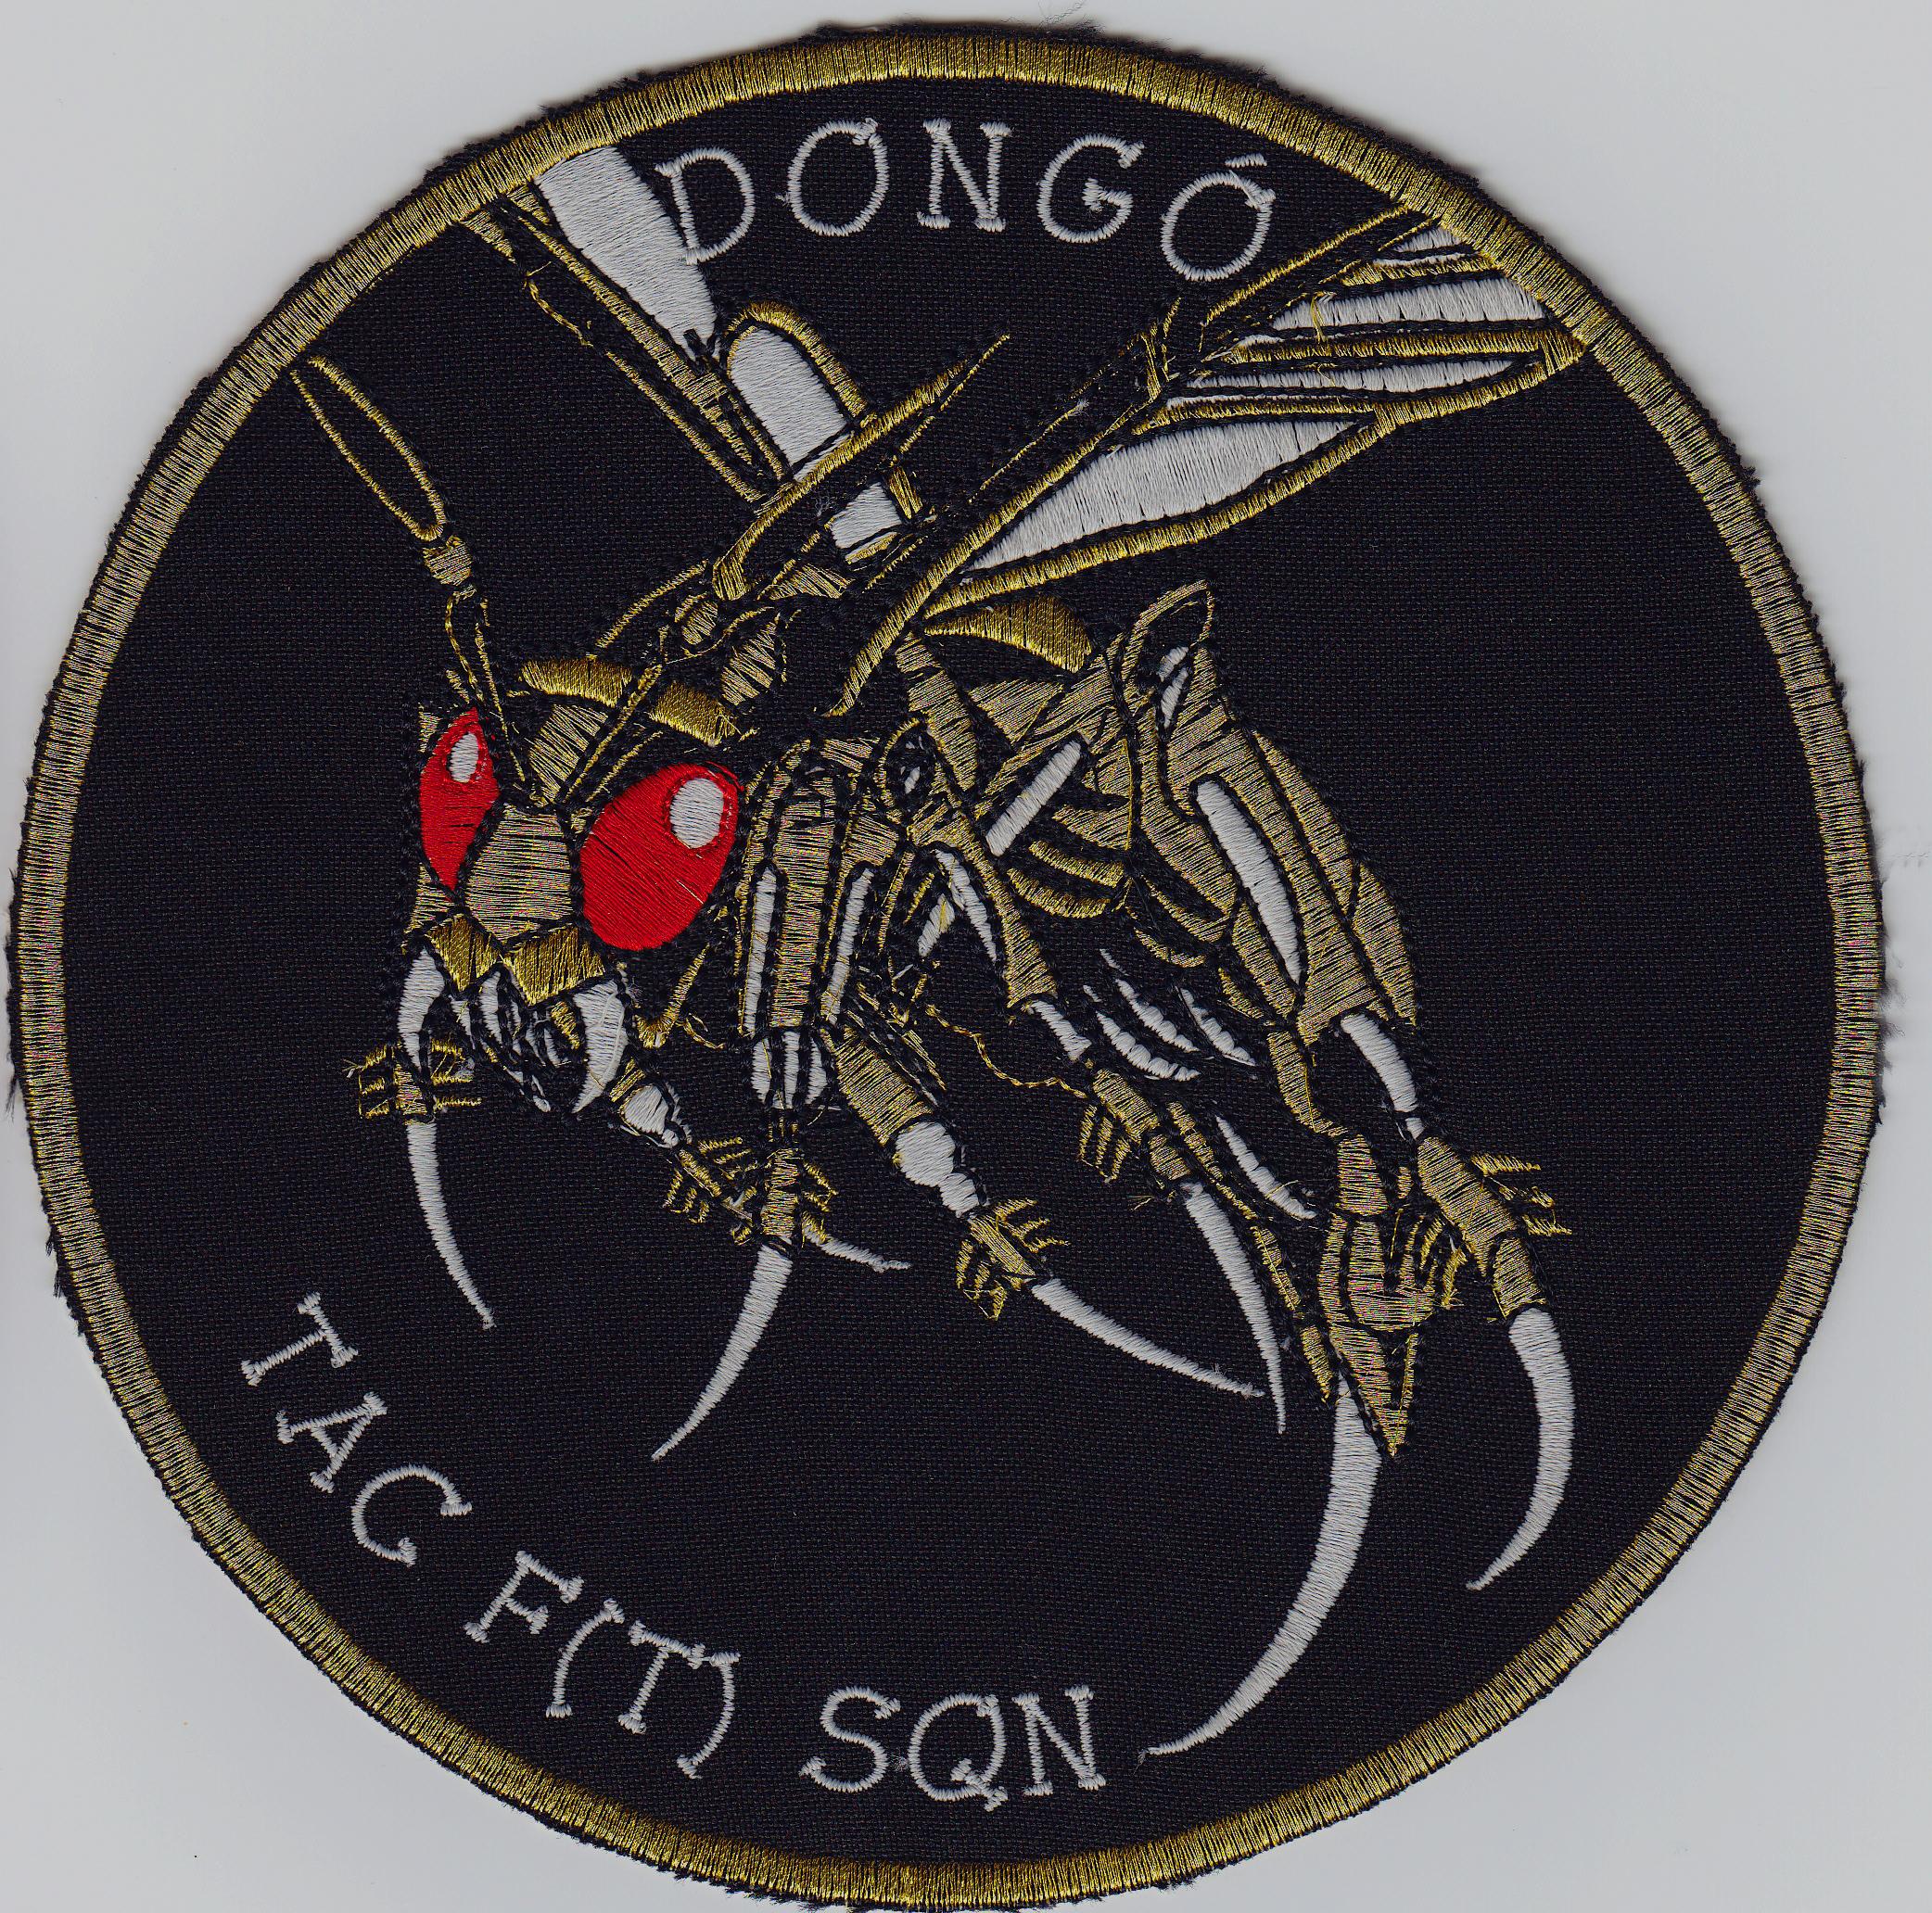 3ba8fda8681f Dongó Tac F(T) Sqn felvarró 19 cm (Arany hímzés) JETfly Military Webshop